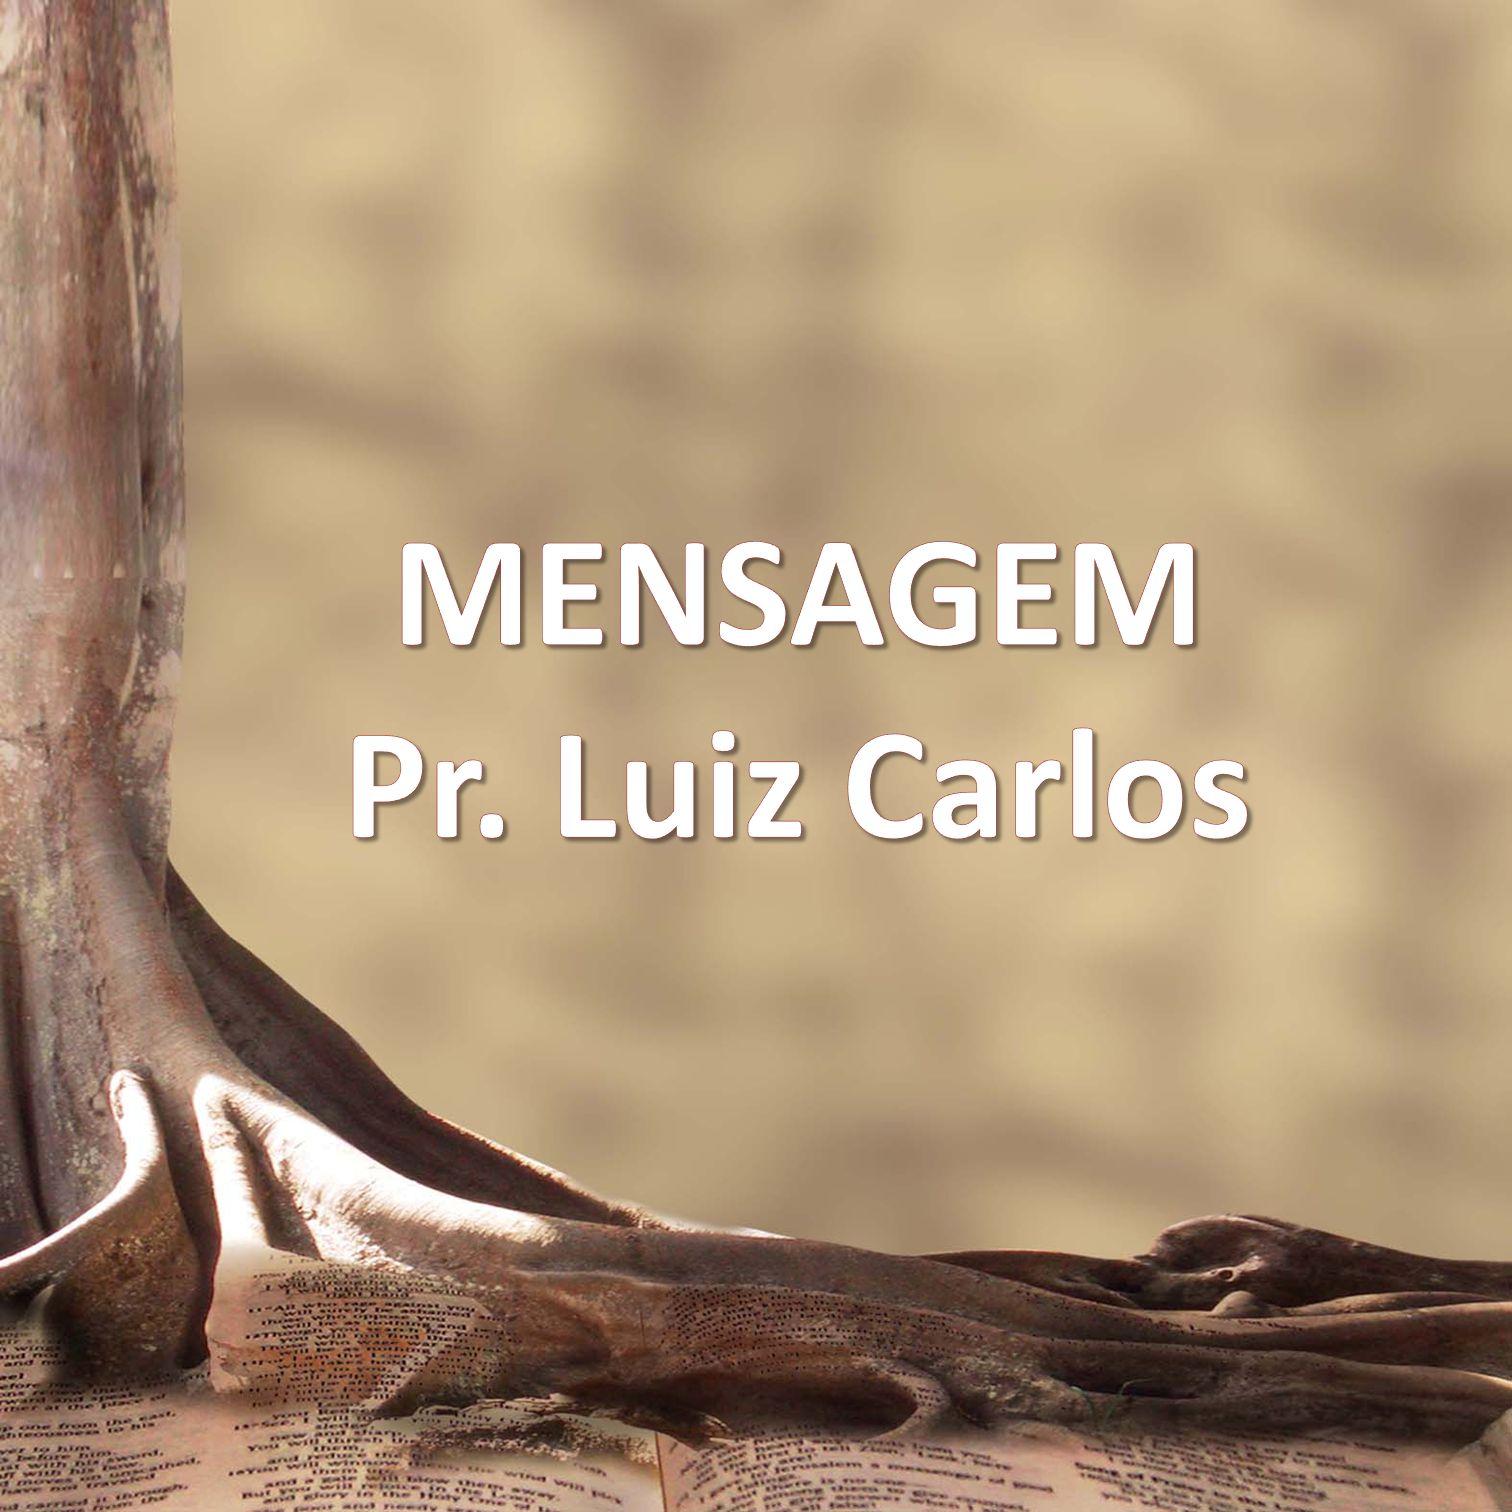 MENSAGEM Pr. Luiz Carlos